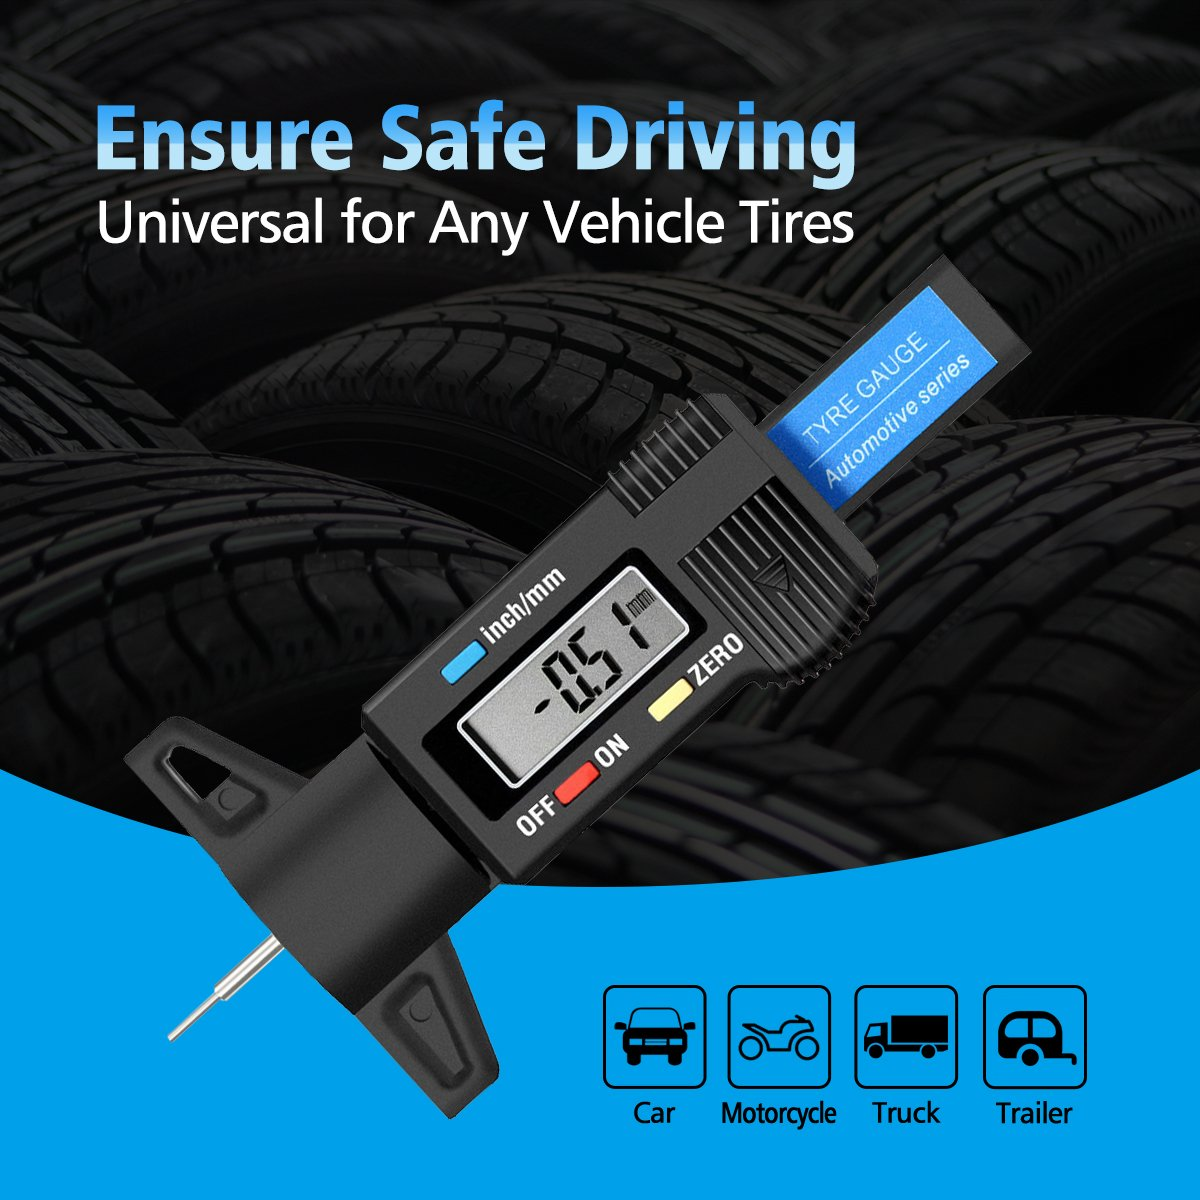 Audew Digital Tire Tread Depth Gauge - Digital Tire Gauge Meter Measurer LCD Display Tread Checker Tire Tester for Cars Trucks Vans SUV, Metric Inch Conversion 0-25.4mm by Audew (Image #5)